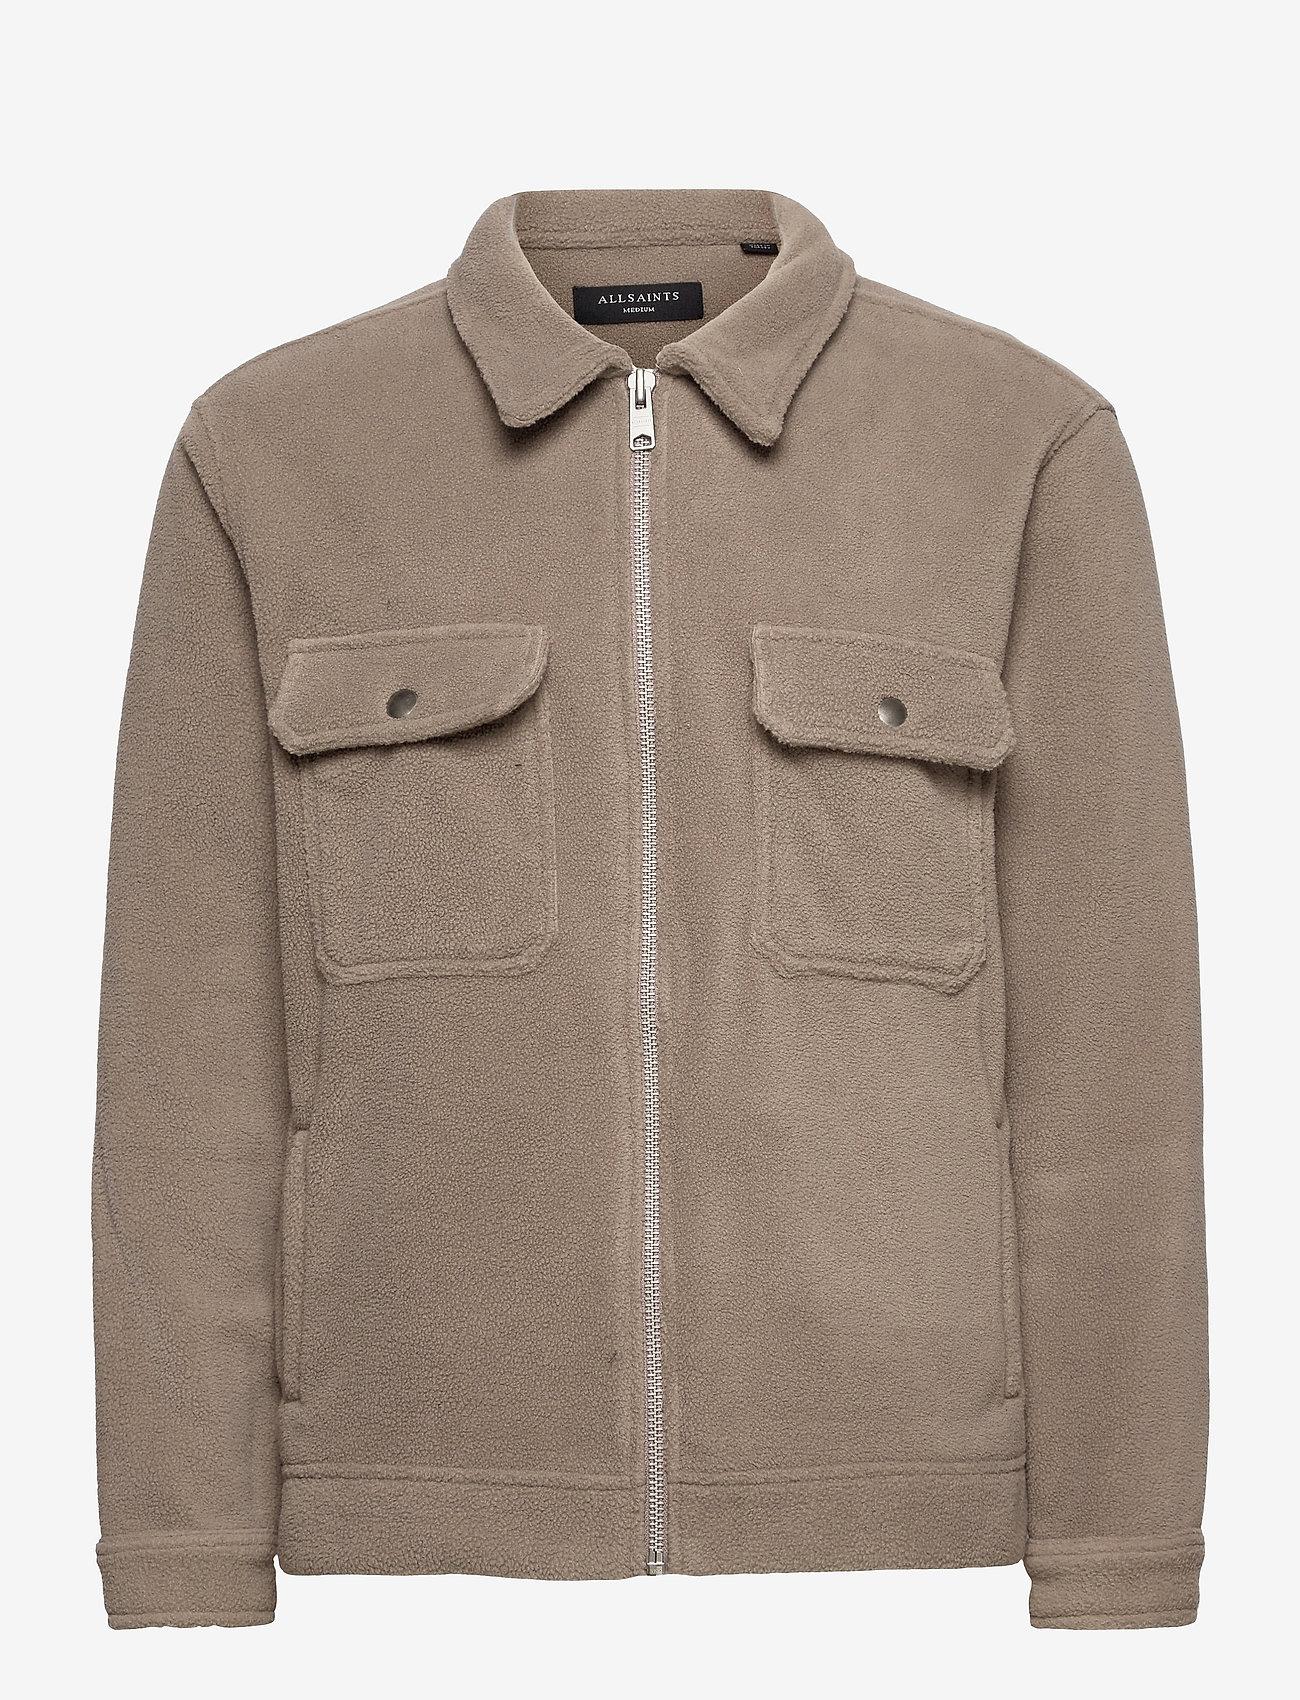 AllSaints - CLAYTON JACKET - basic-sweatshirts - mangrove brown - 0